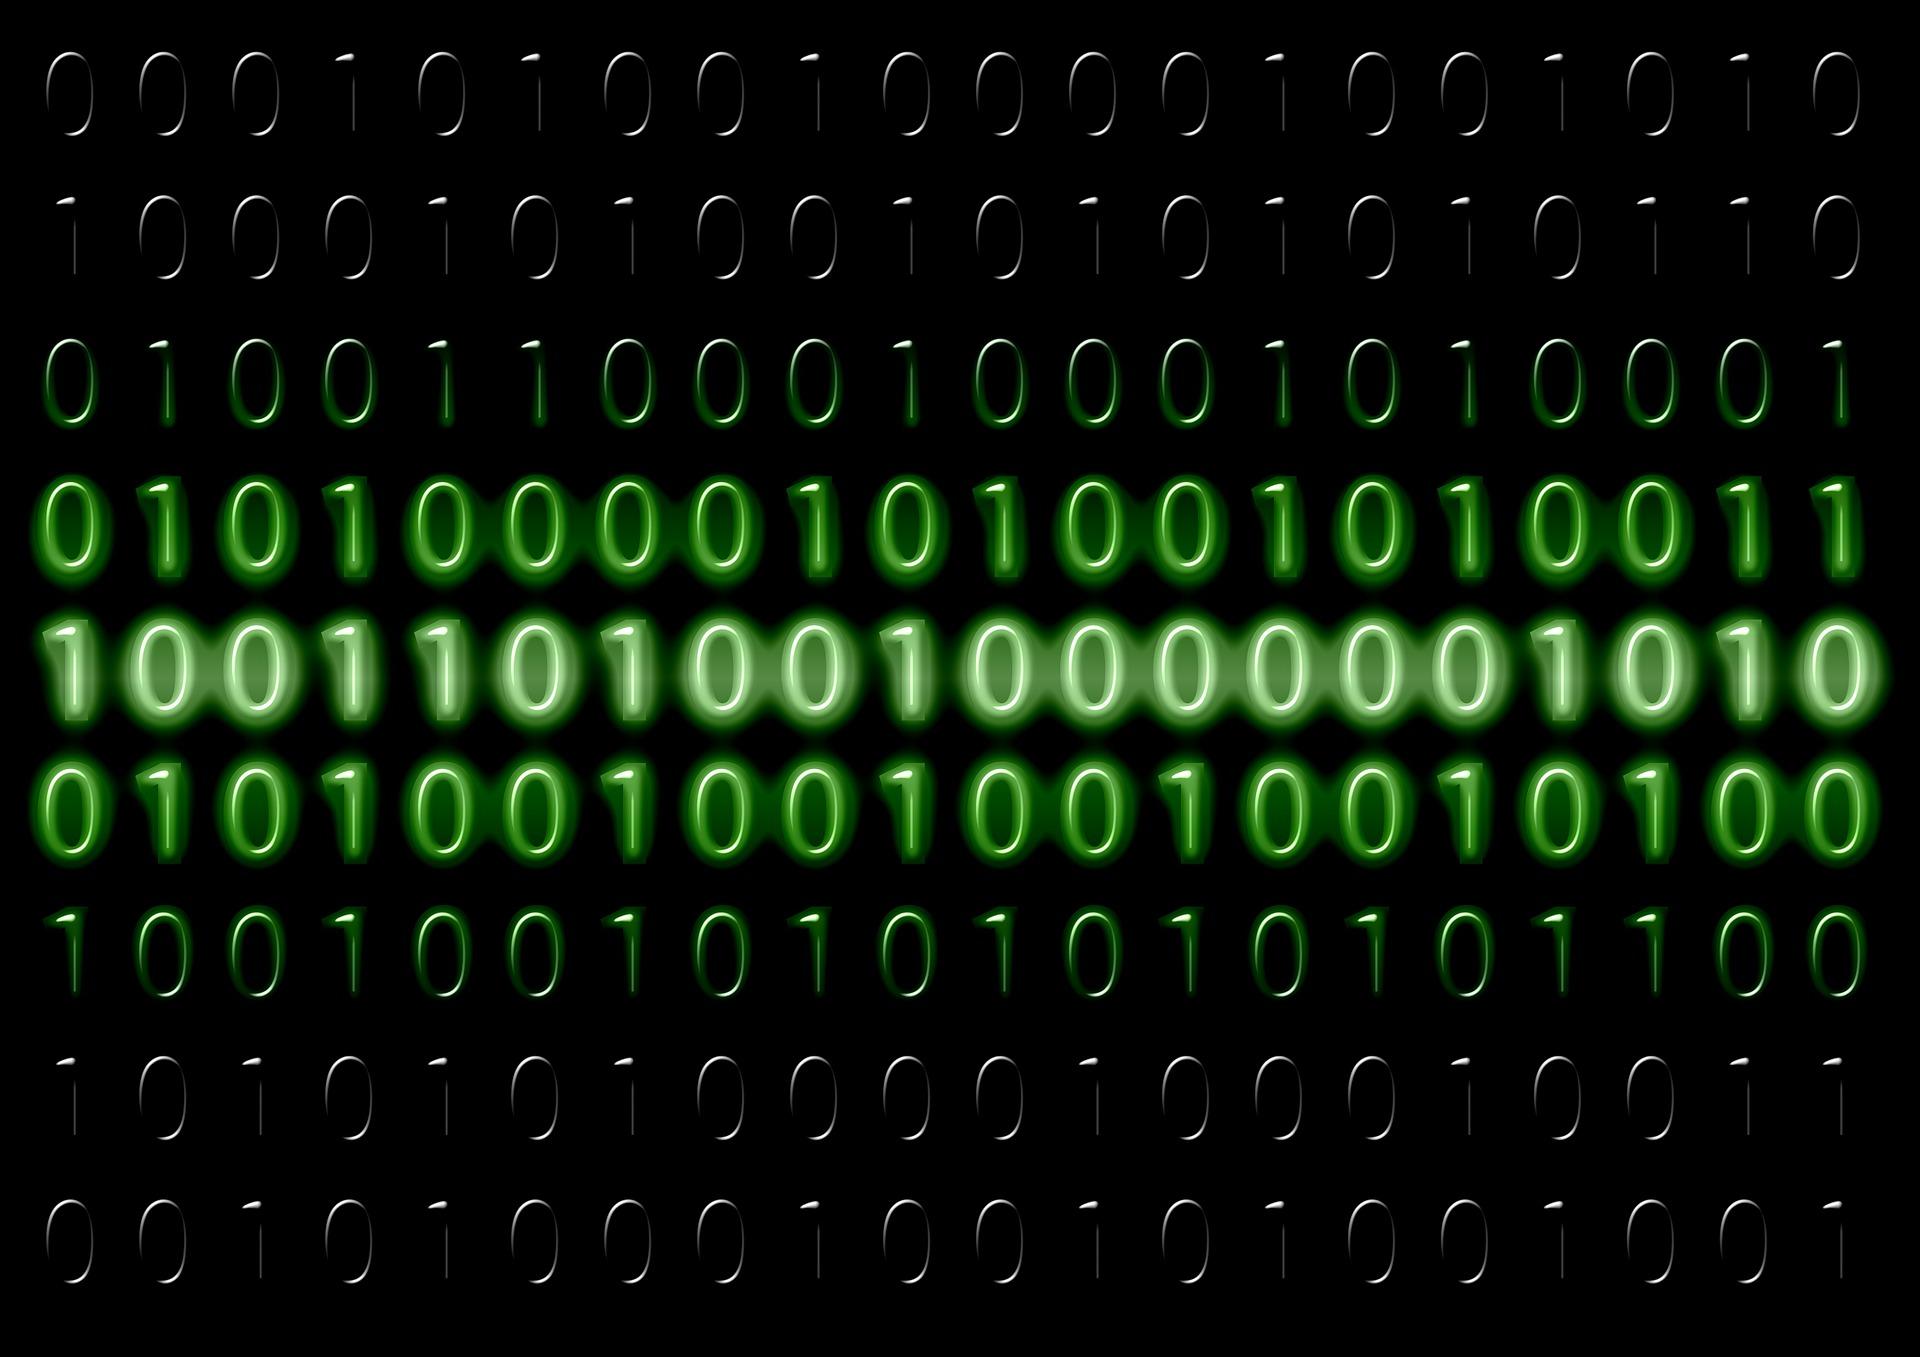 Silwood Technology expands Safyr's SAP metadata analysis capabilities